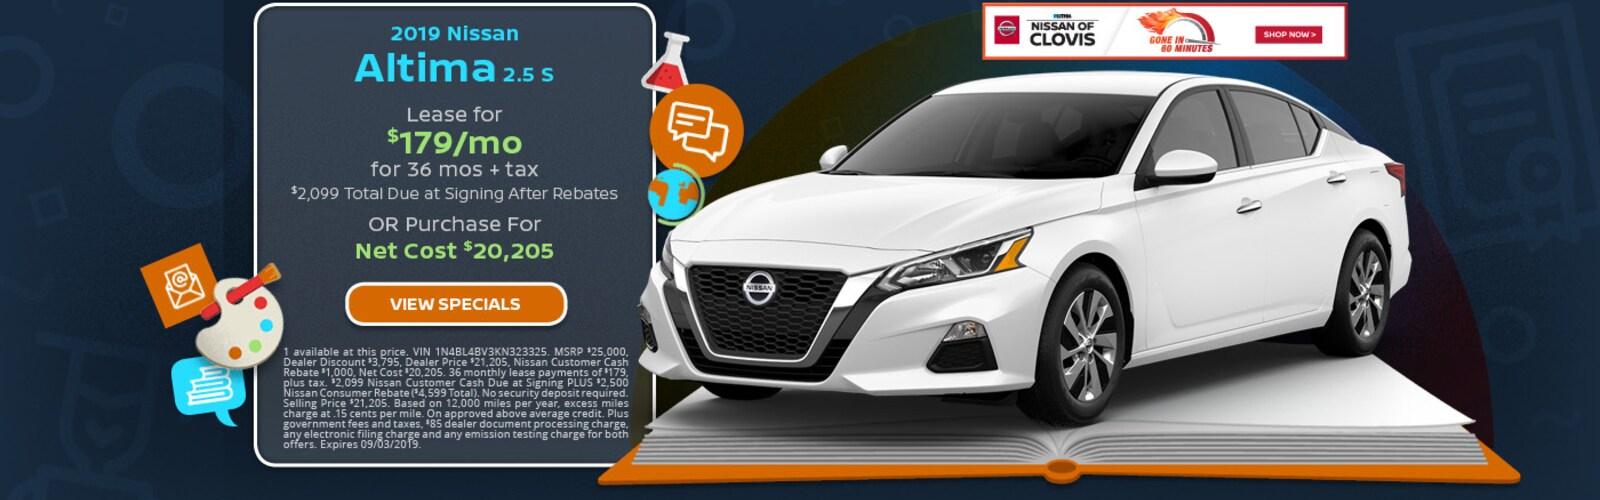 Lithia Nissan Of Fresno >> New & Used Nissan Dealership in Clovis | Nissan of Clovis ...